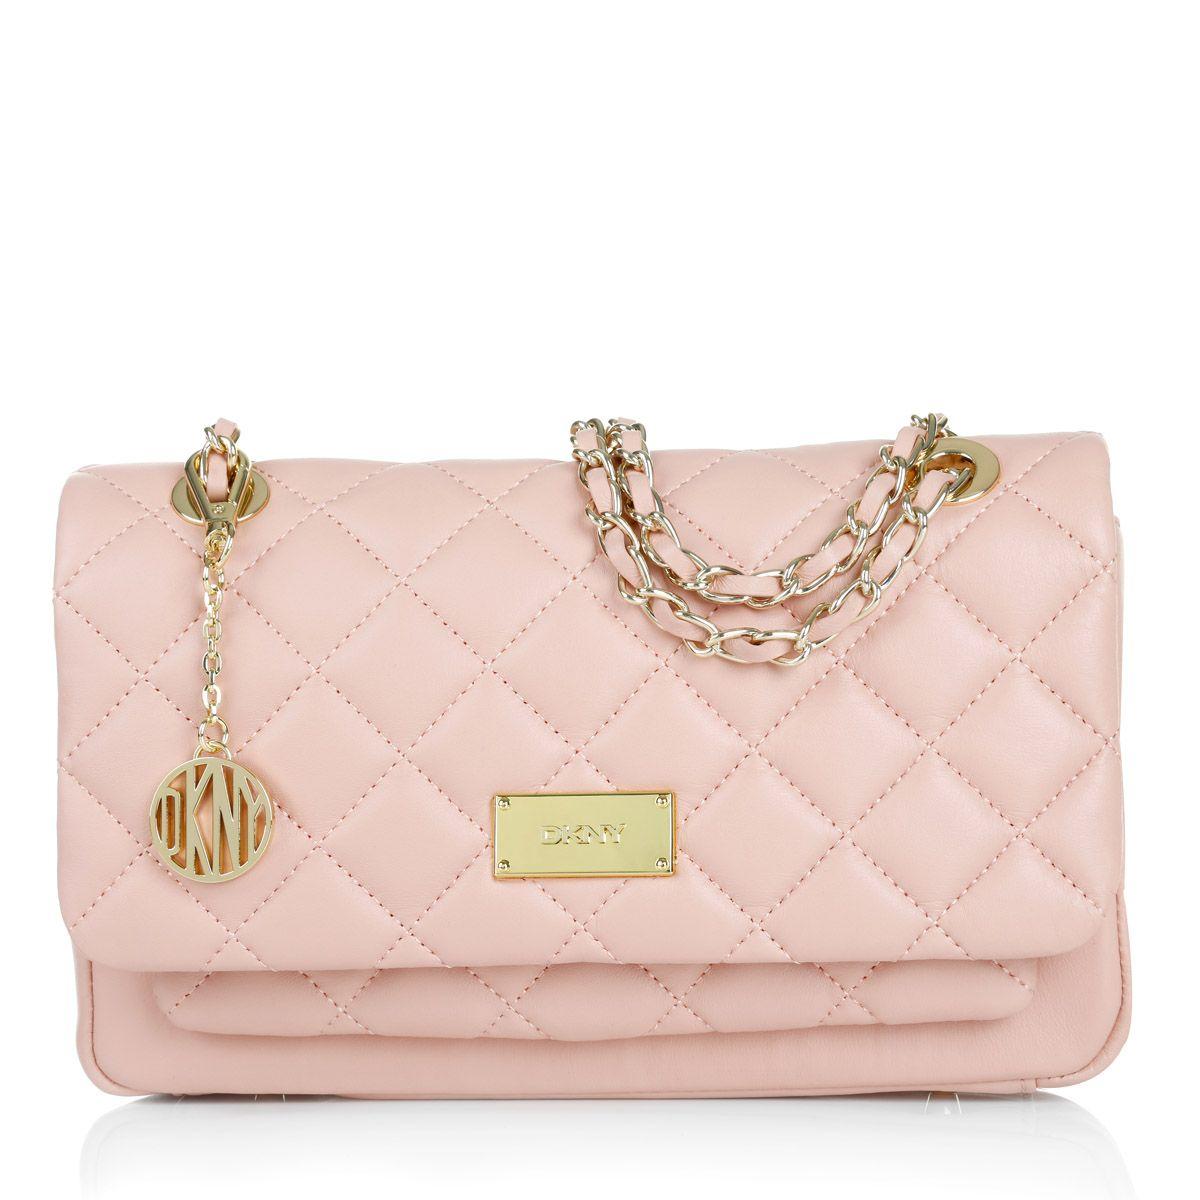 Gansevoort Quilted Nappa Crossbody Bag Pink   bags   Pinterest ...